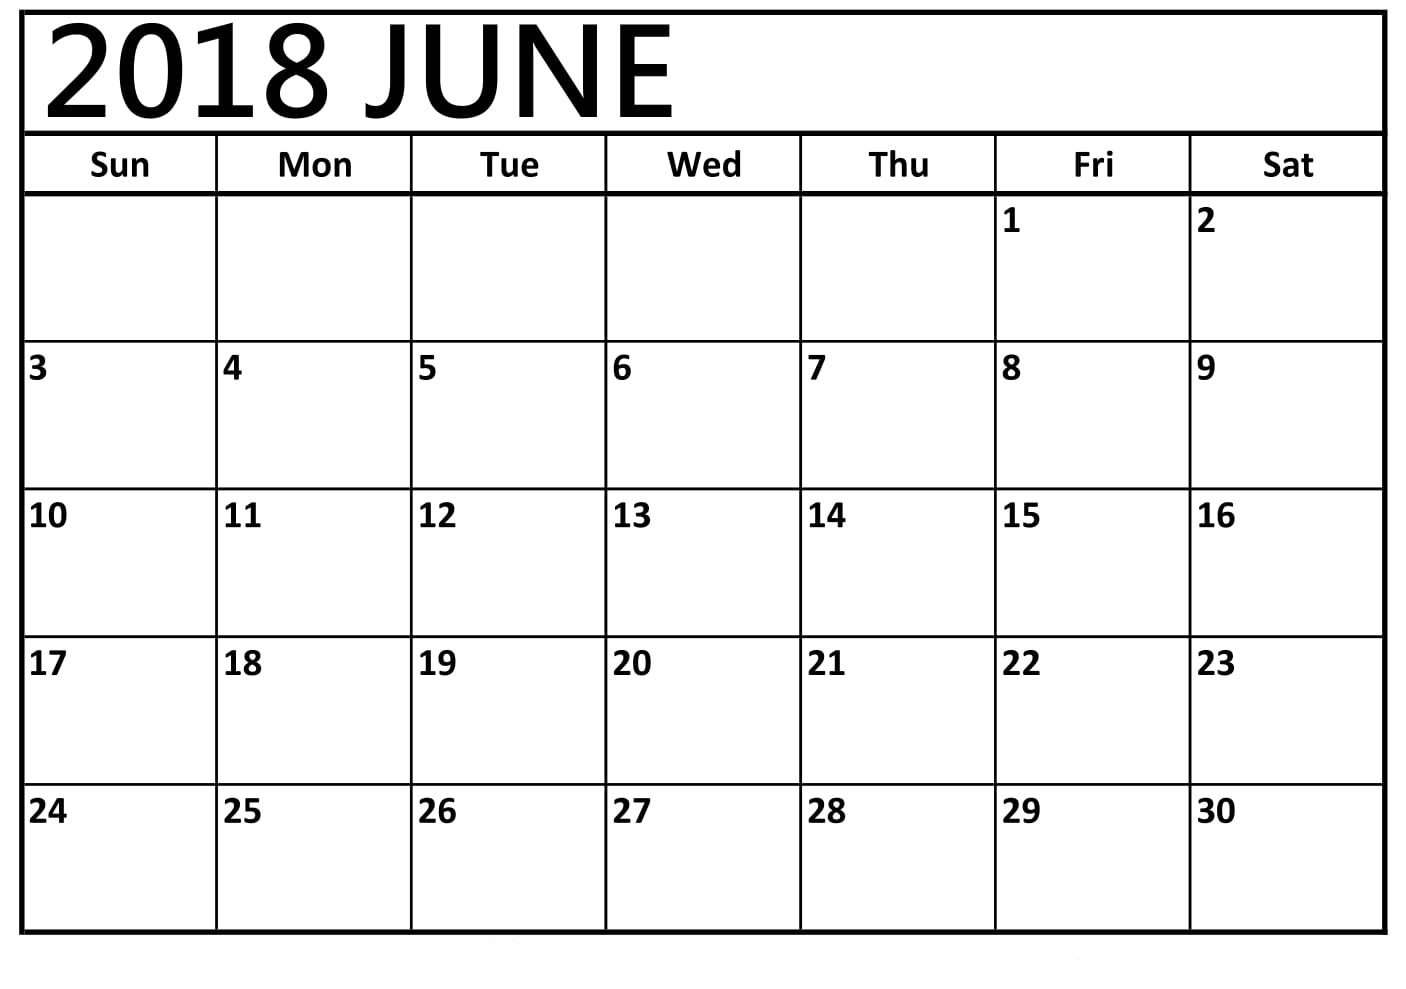 2018 June Calendar Blank Printable